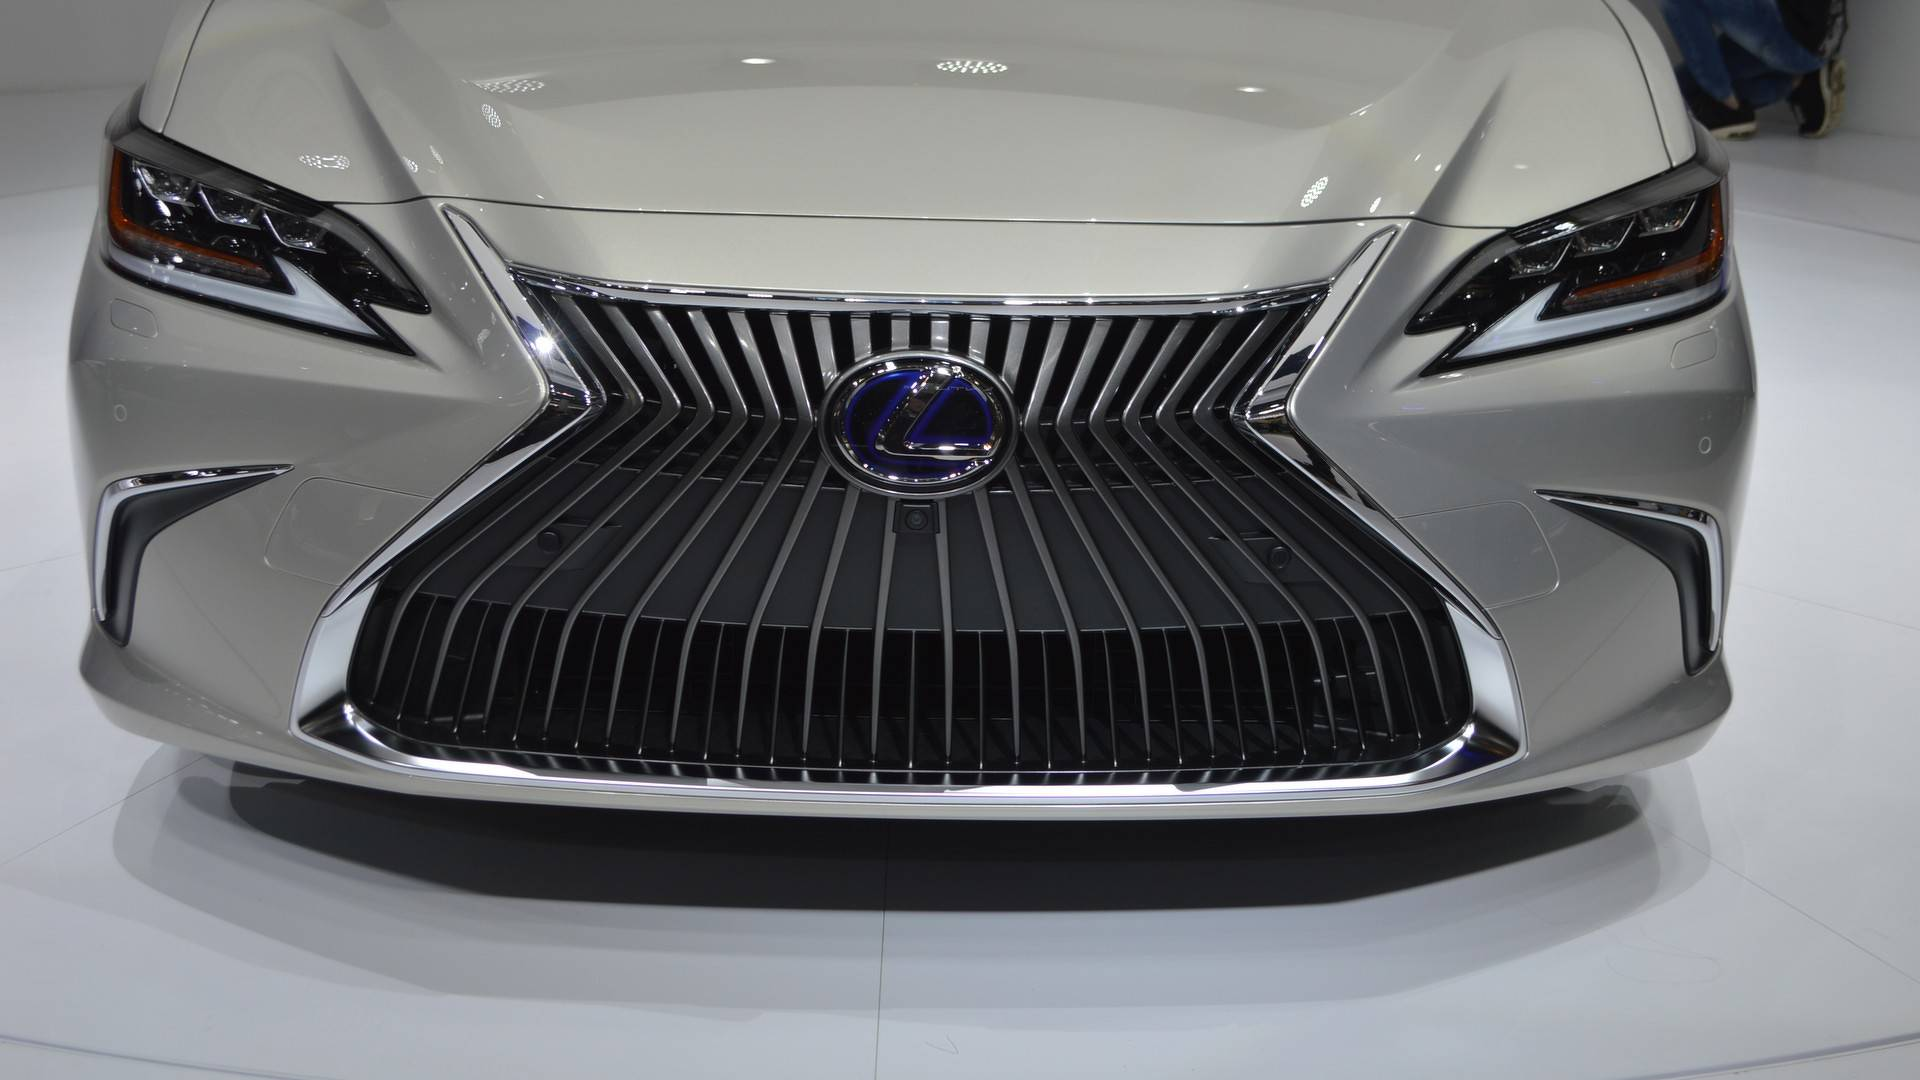 Lexus Es 350 2019 >> لكزس اي اس 2019 الشكل الجديد الجيل السابع تدشن نفسها رسمياً Lexus ES - المربع نت | تابع اخر ...